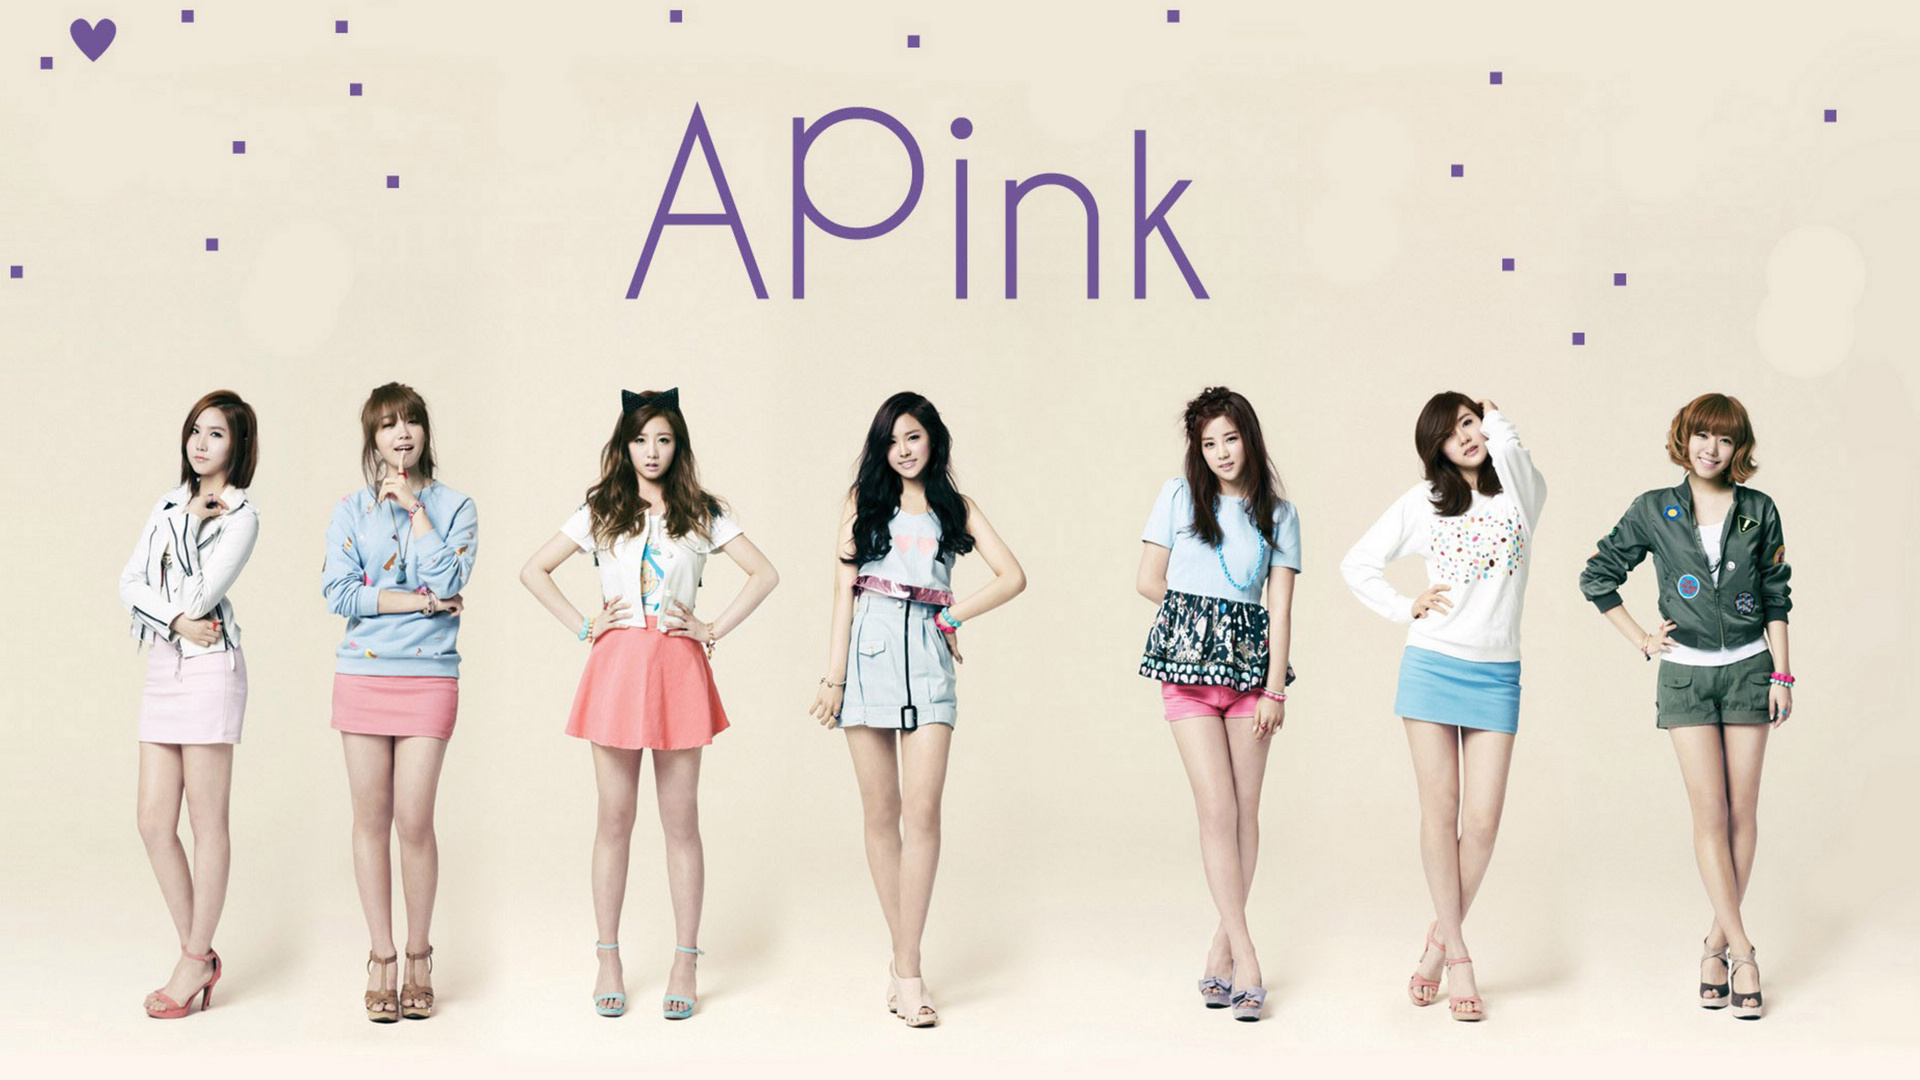 A Pink(朴初珑、尹普美、郑恩地、孙娜恩、金南珠、吴夏荣)(壁纸1)